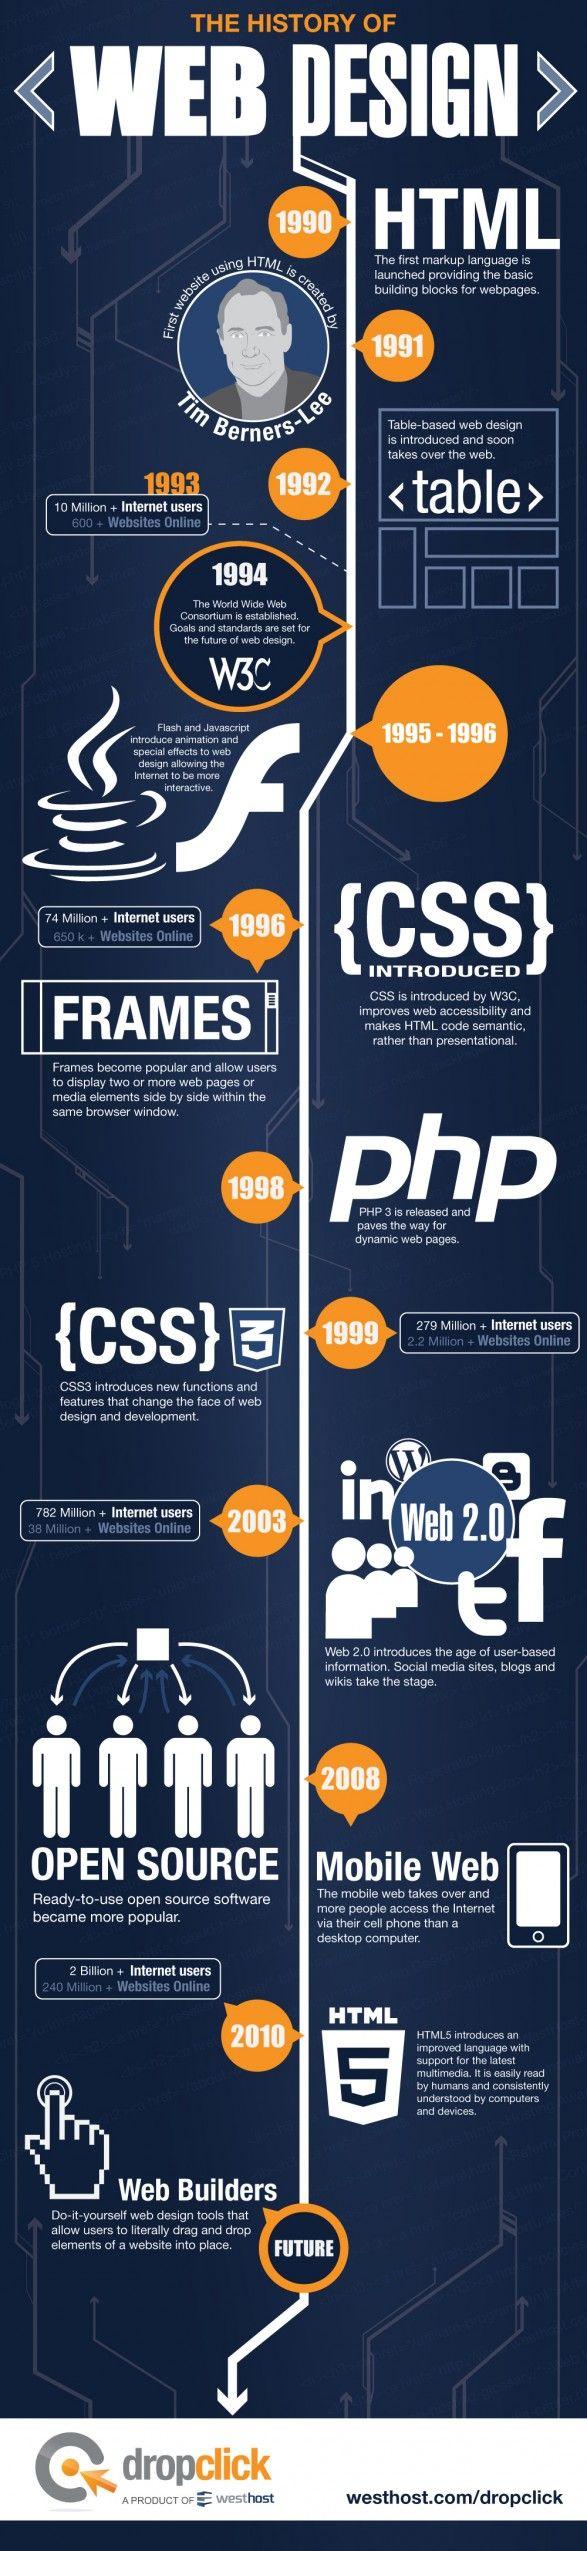 La historia del Diseño Web #infografia #disenoweb @Jorge Forero dweb3d.com #followback @dweb3d